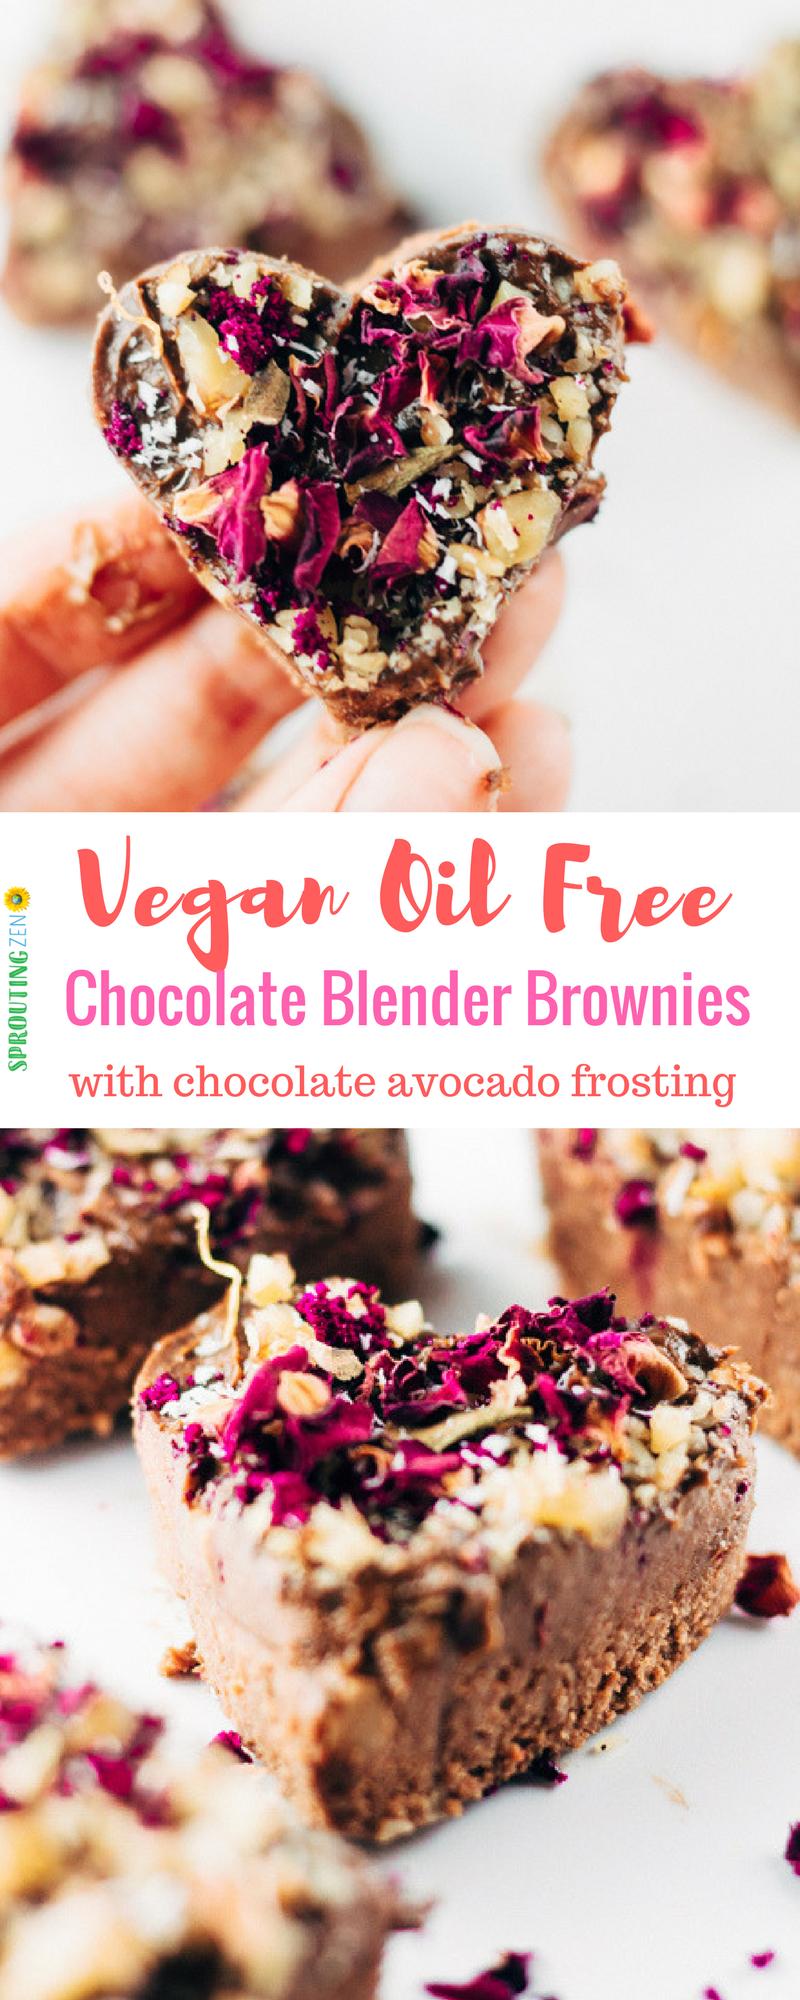 Vegan Chocolate Brownies + Cook Book GIVEAWAY! #VEGAN #PLANTBASED #WHATVEGANSEAT #VDAYRECIPES